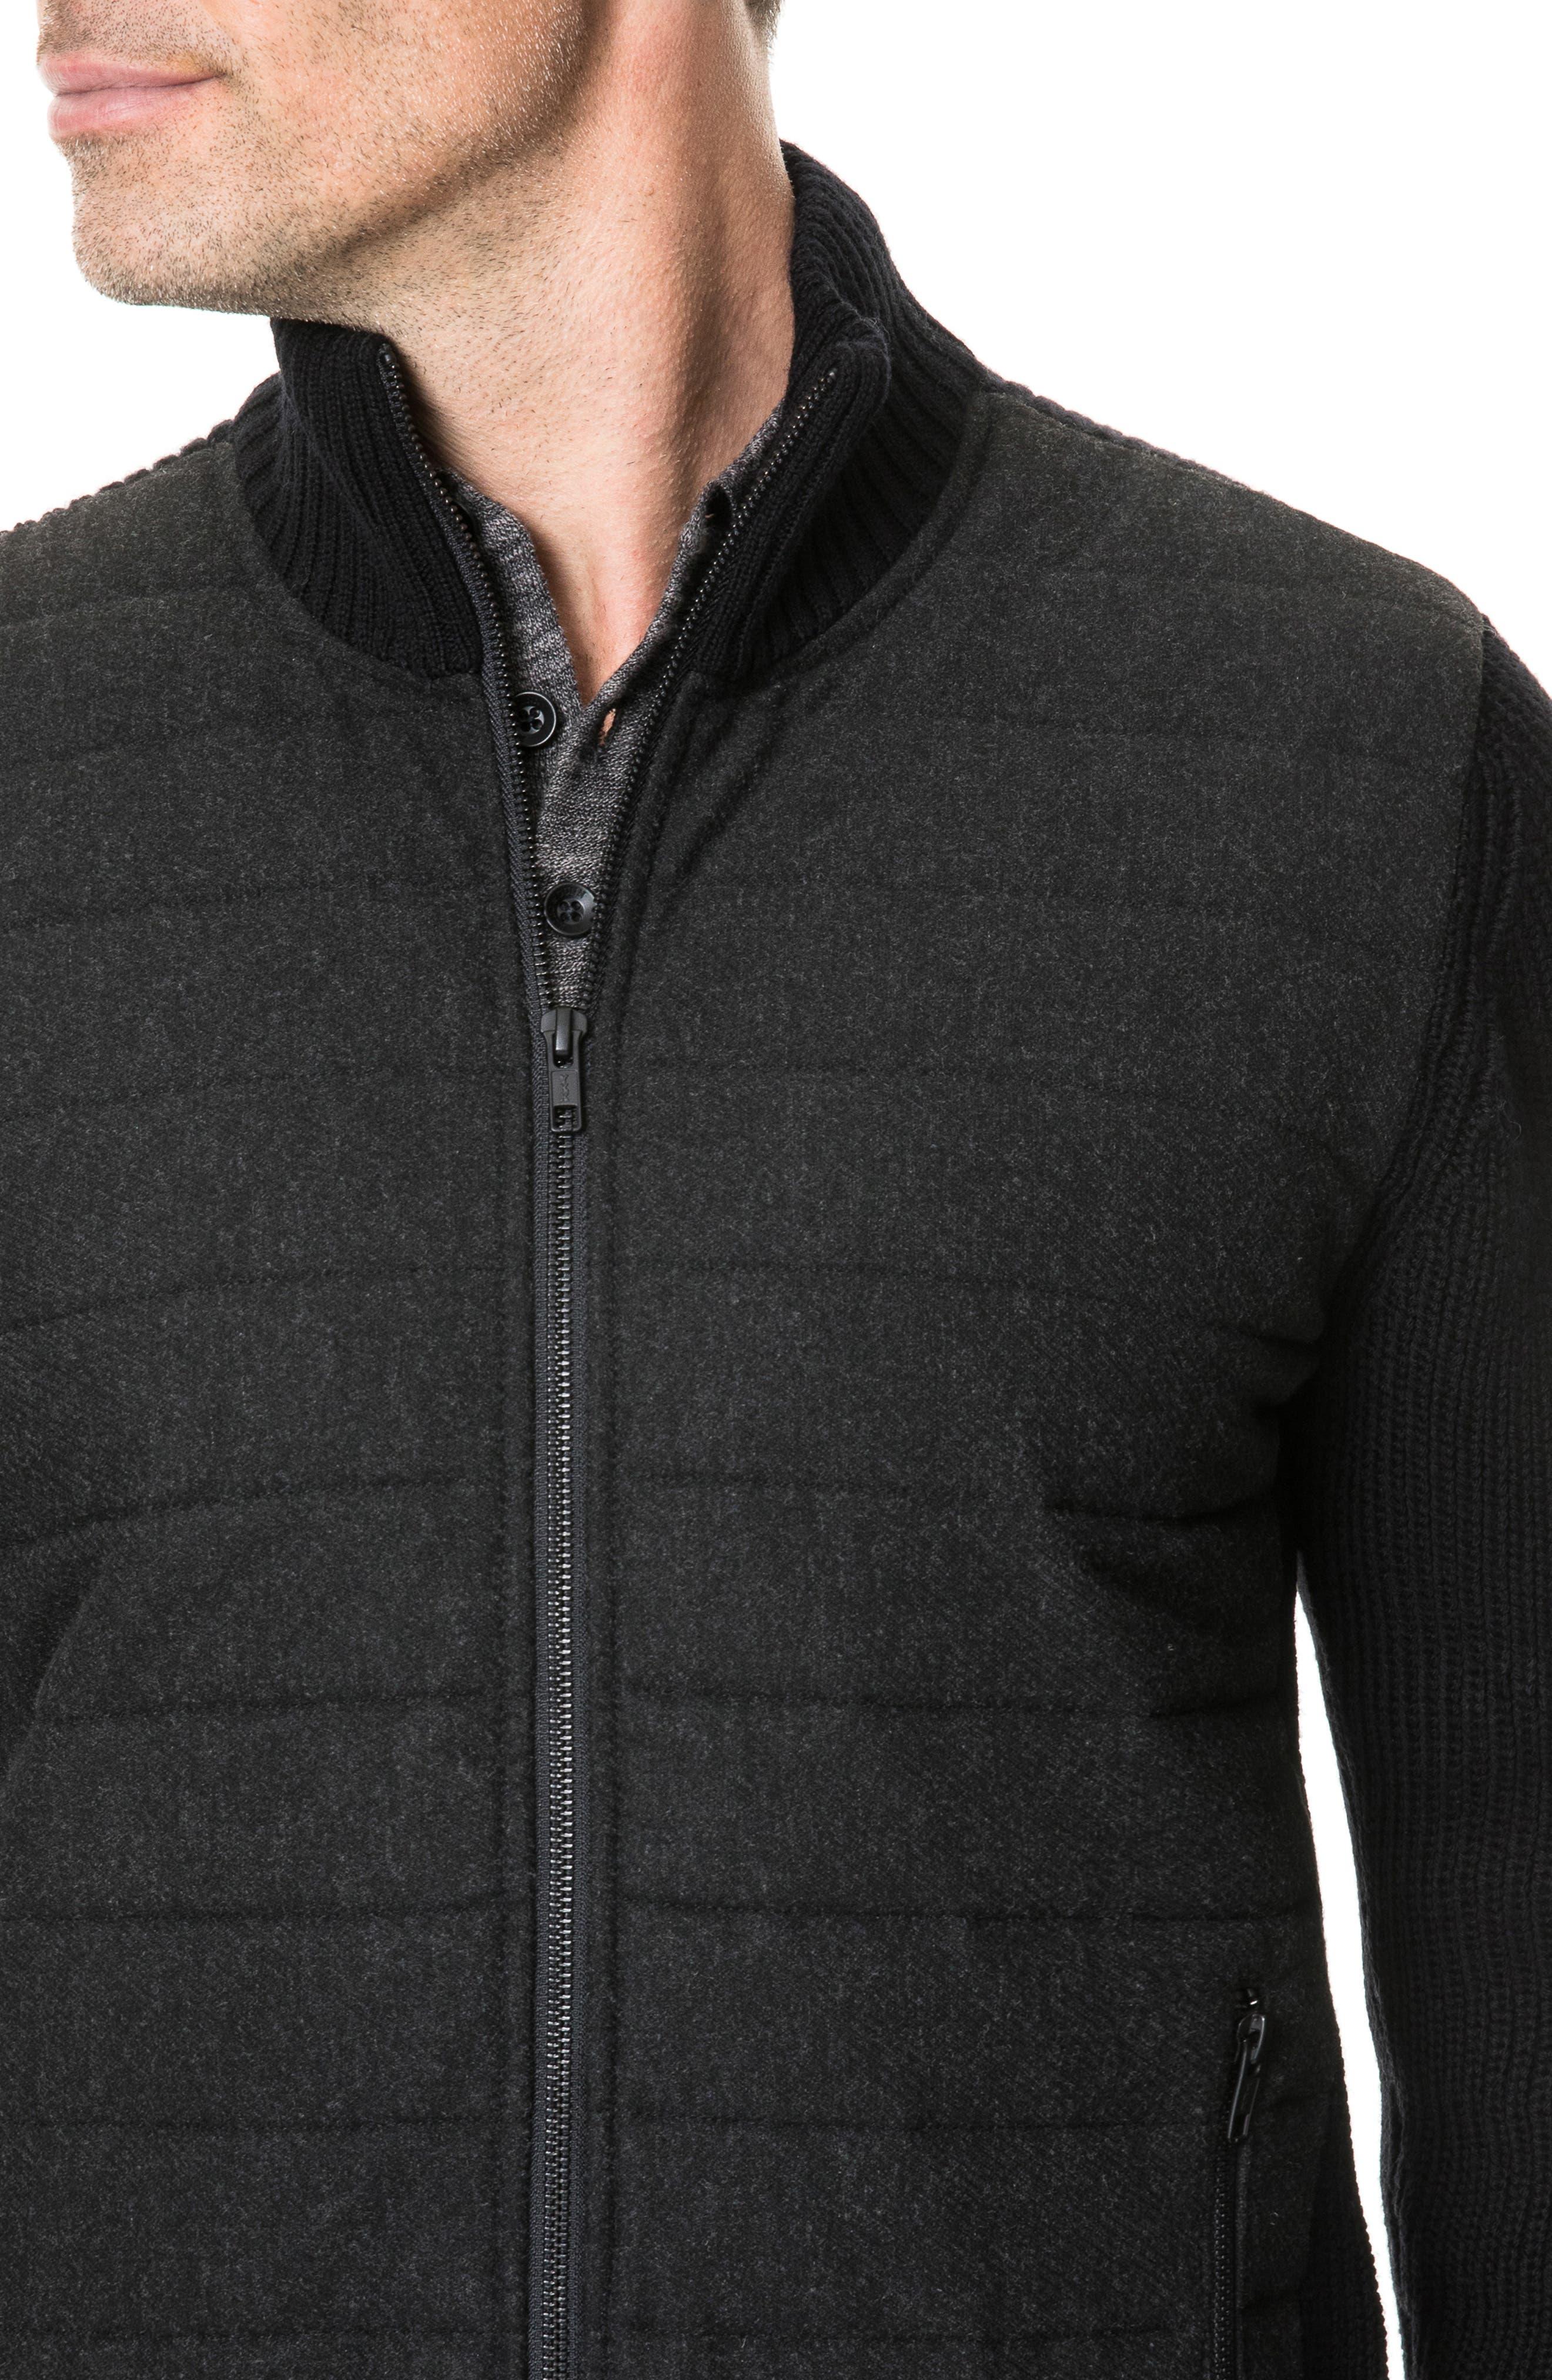 Greerton Regular Fit Zip Sweater,                             Alternate thumbnail 3, color,                             ONYX